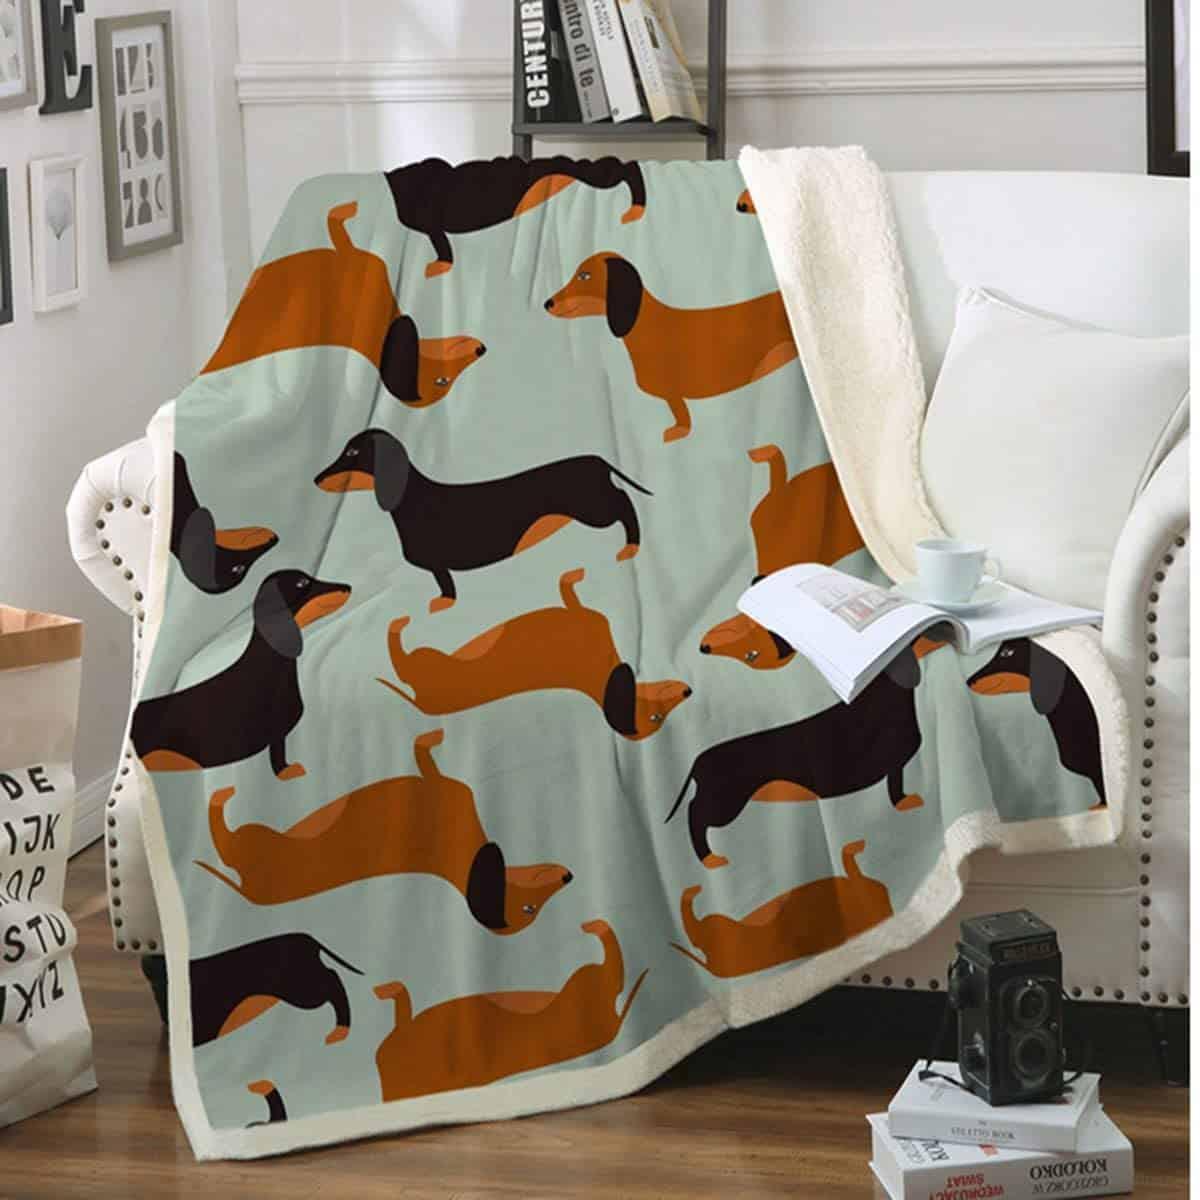 dachshund-gifts-blanket